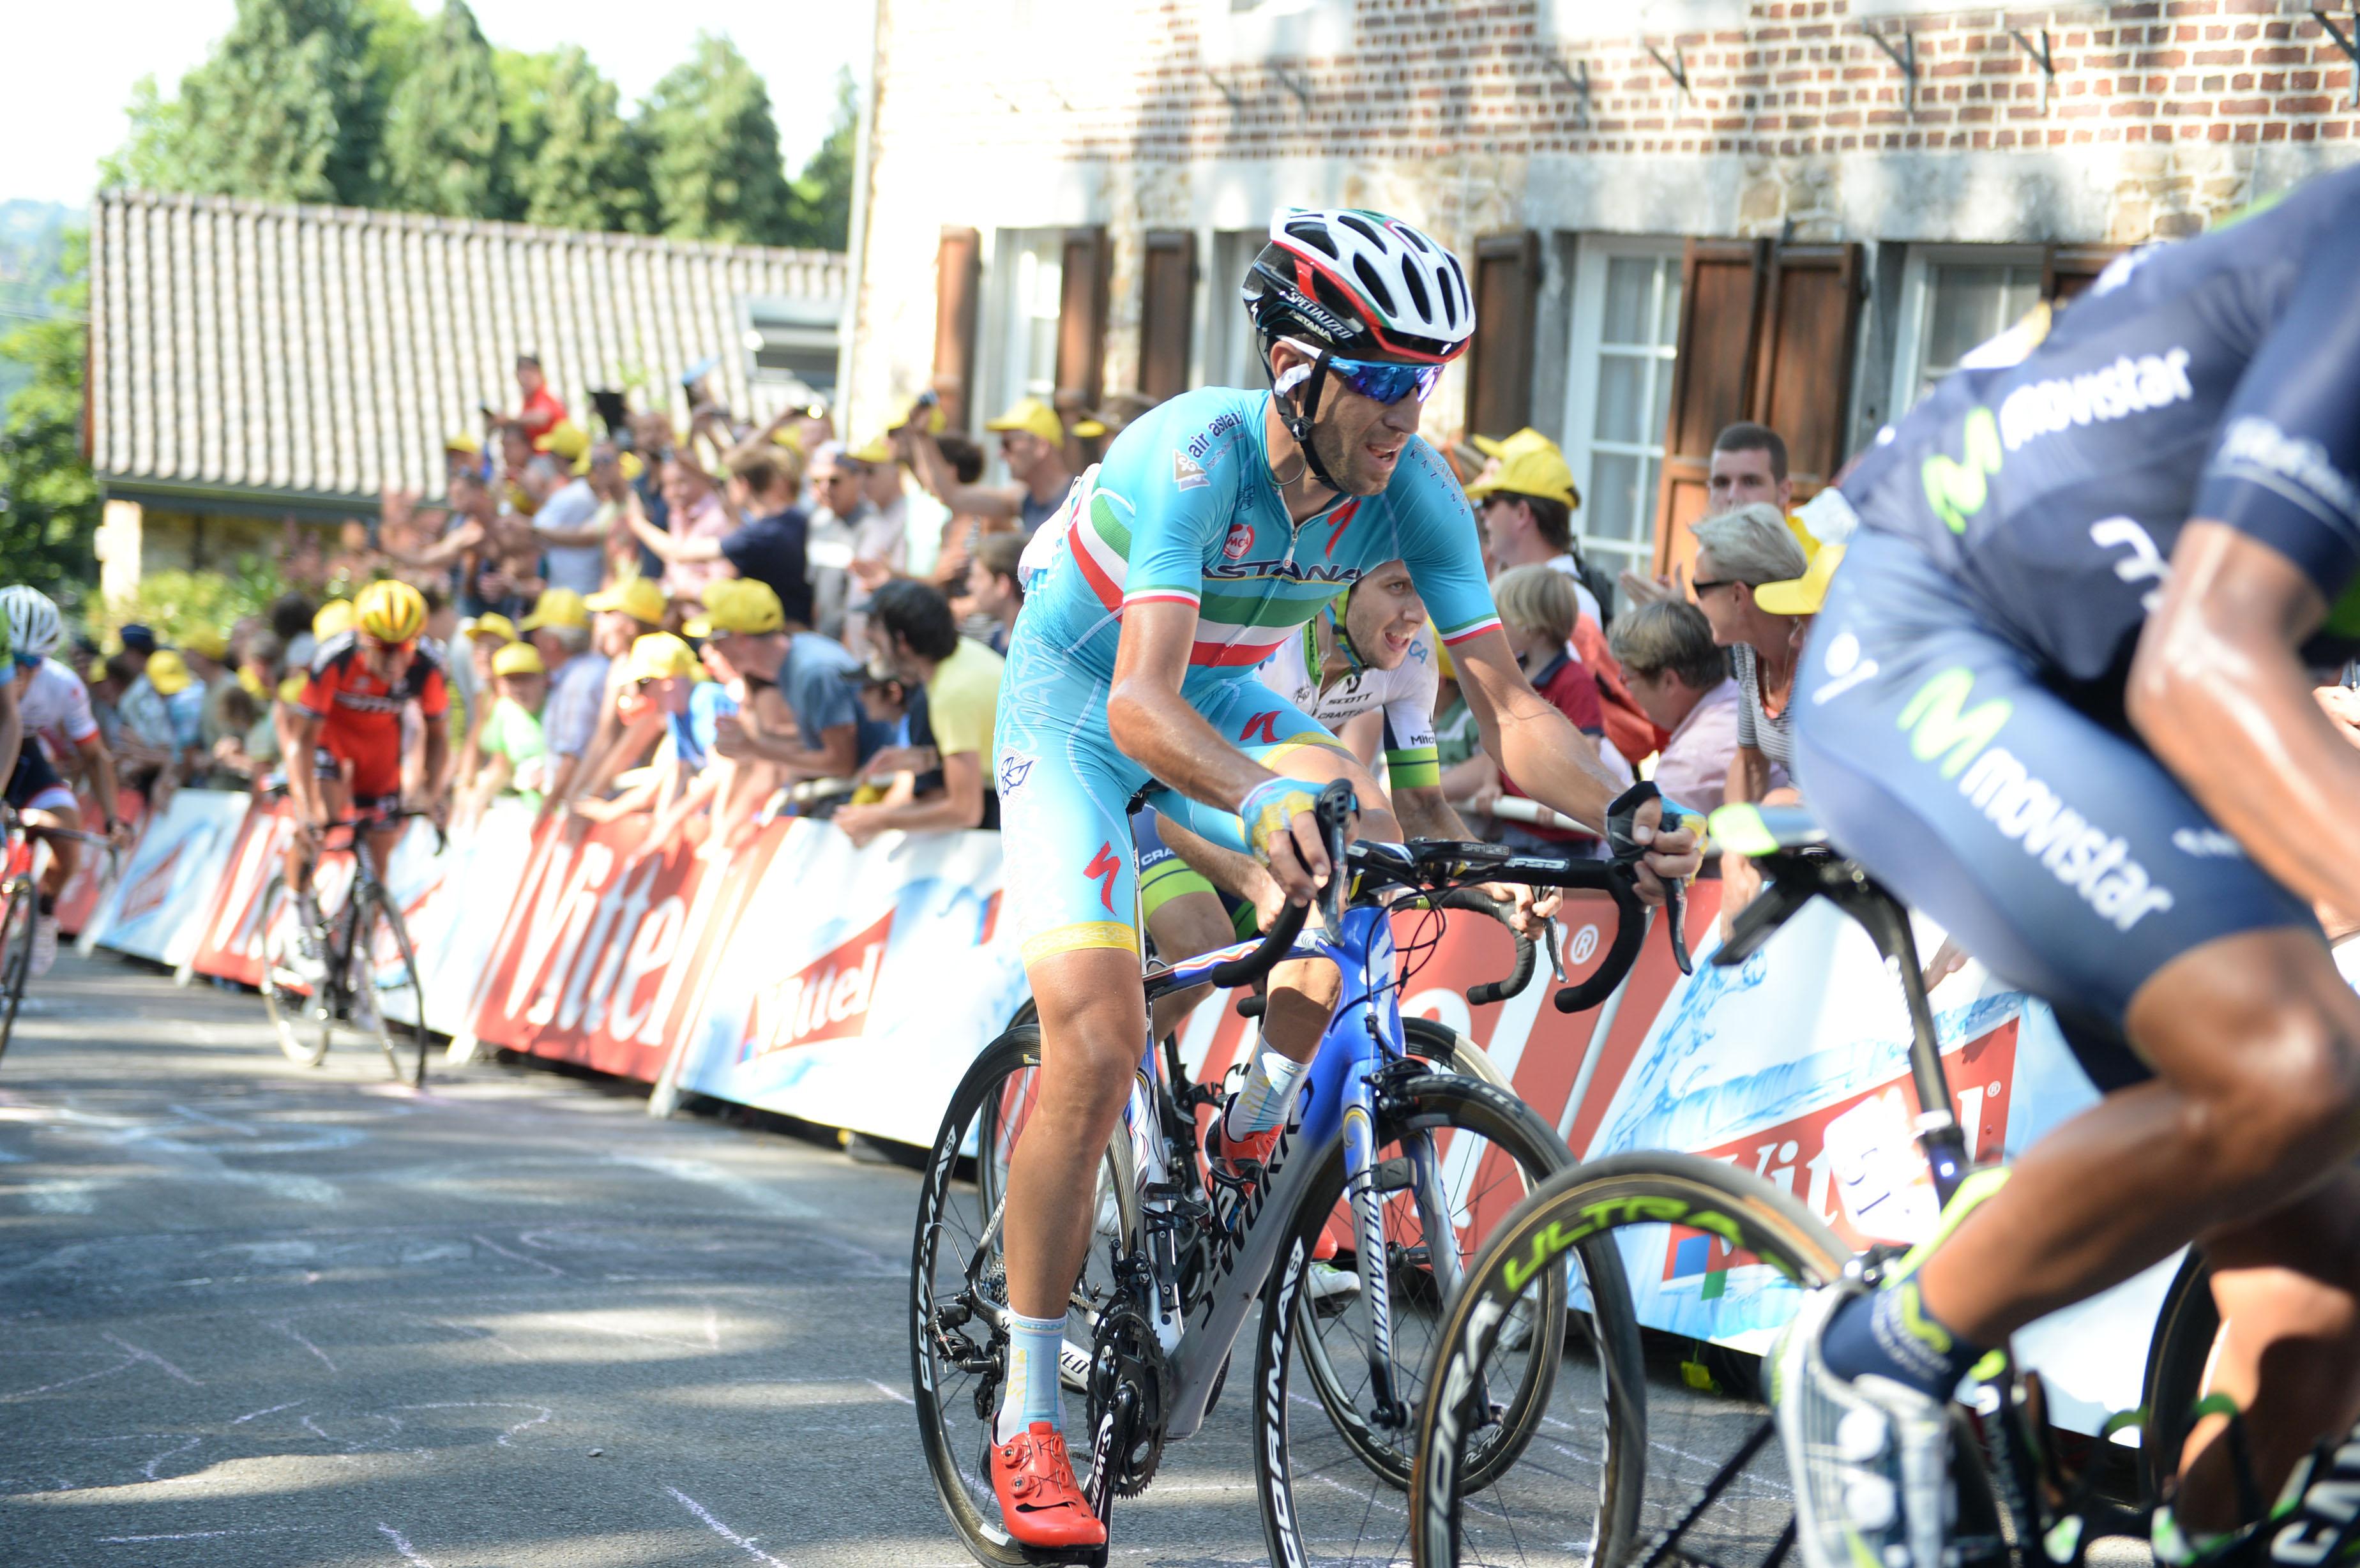 Vincenzo Nibali - Tour de France 2015. (pic: Sirotti)